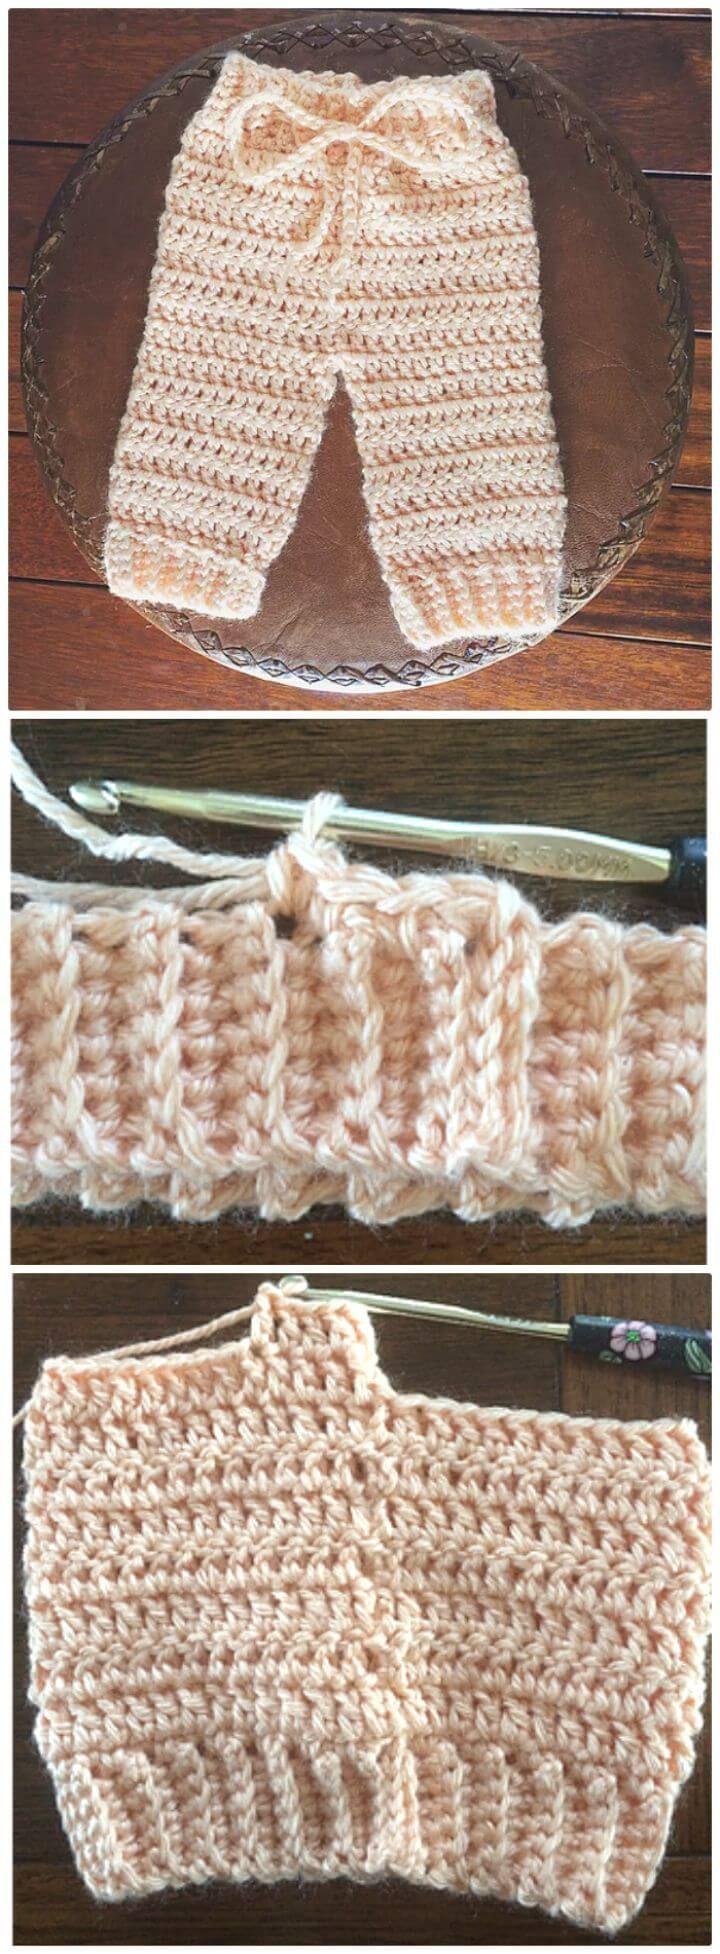 Crochet Baby Pants 9 Free Patterns Free Crochet Patterns